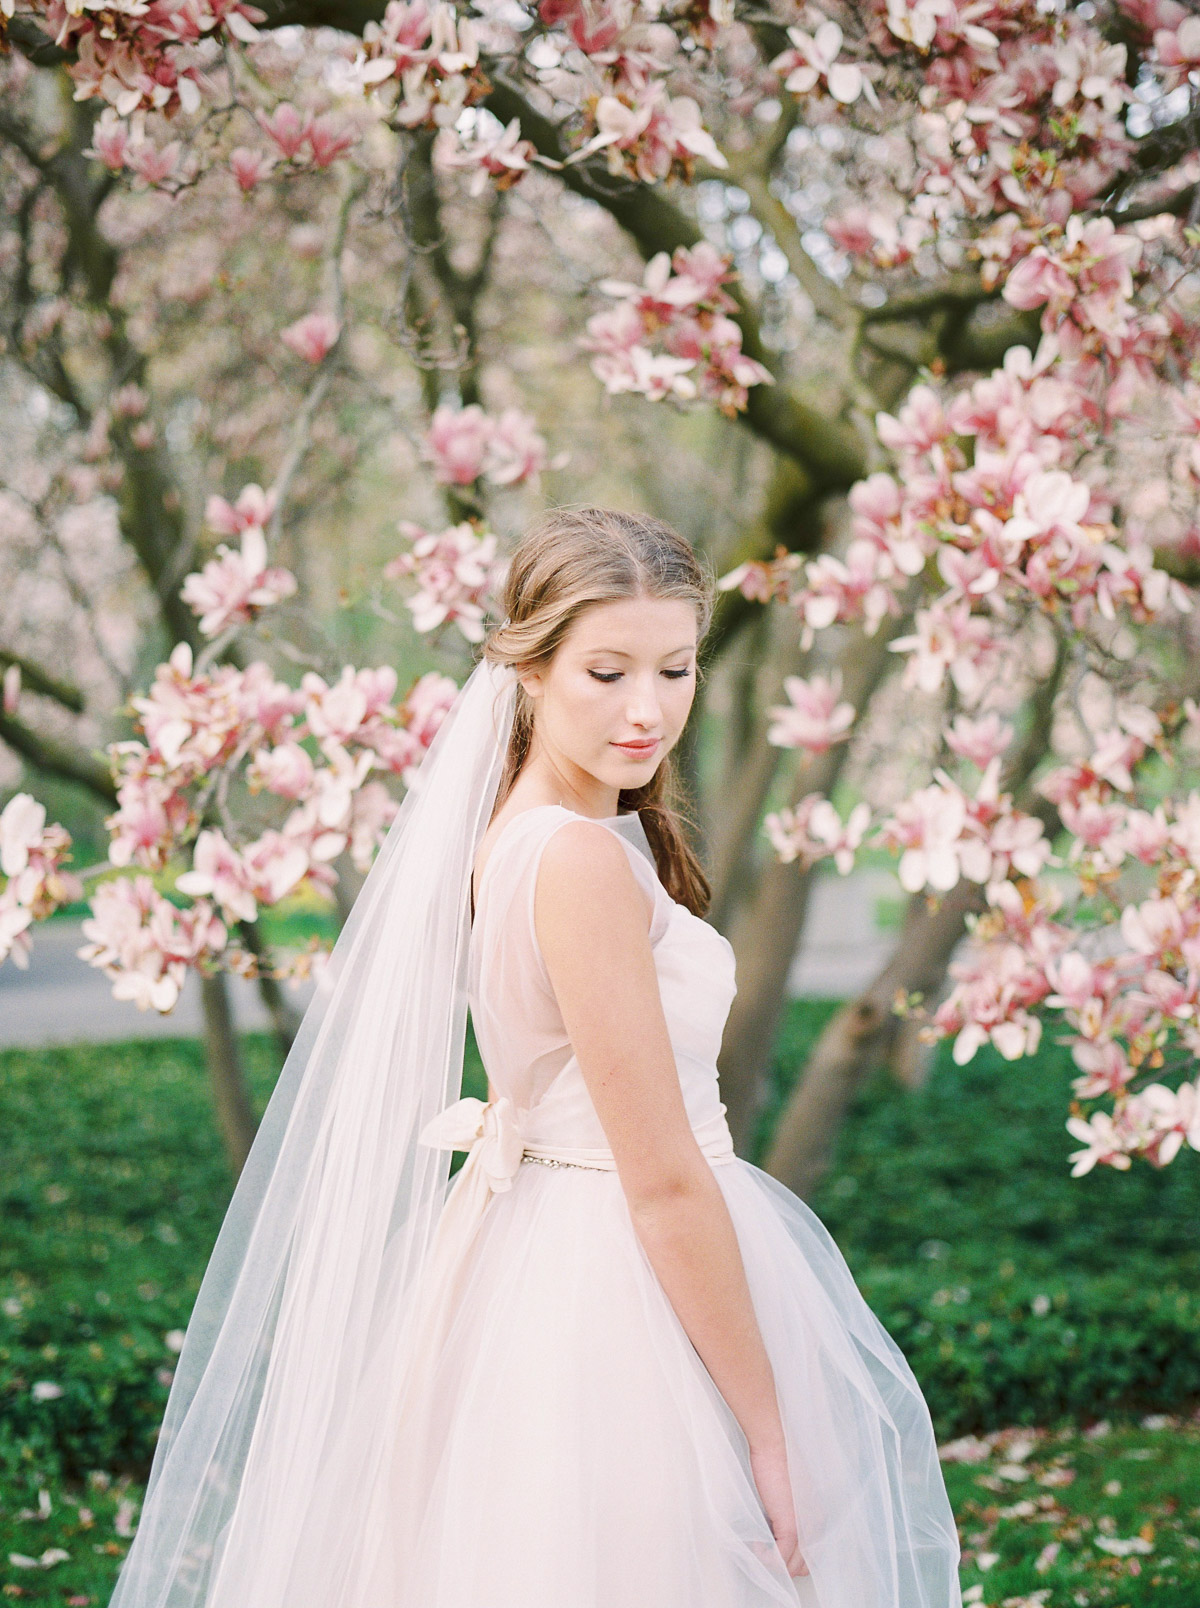 julia-park-photography-vineyard-bride-swish-list-niagara-on-the-lake-wedding-editorial-34.jpg